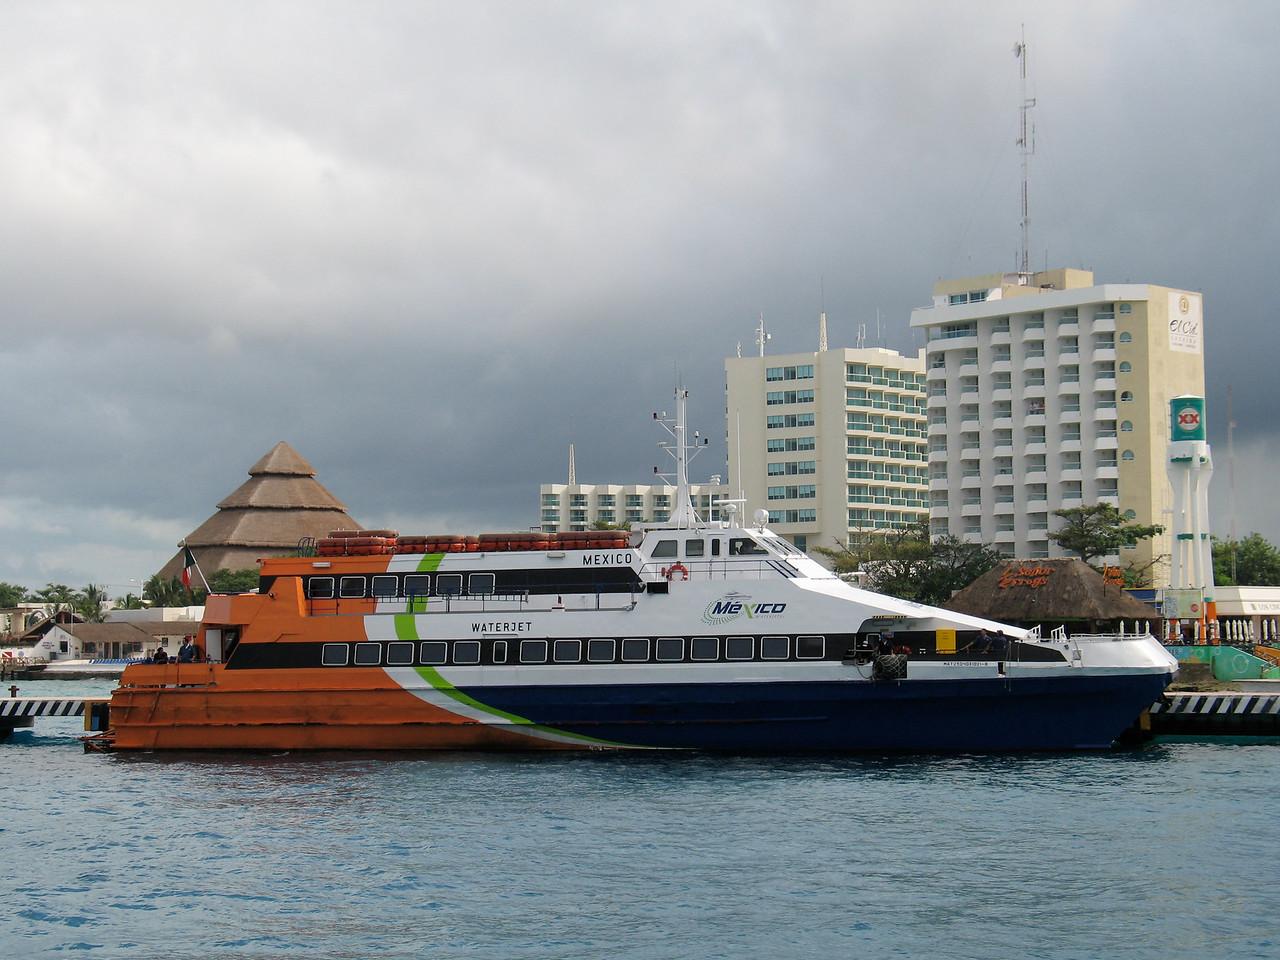 We arrive in Cozumel for a boat ride to Playa del Carmen.